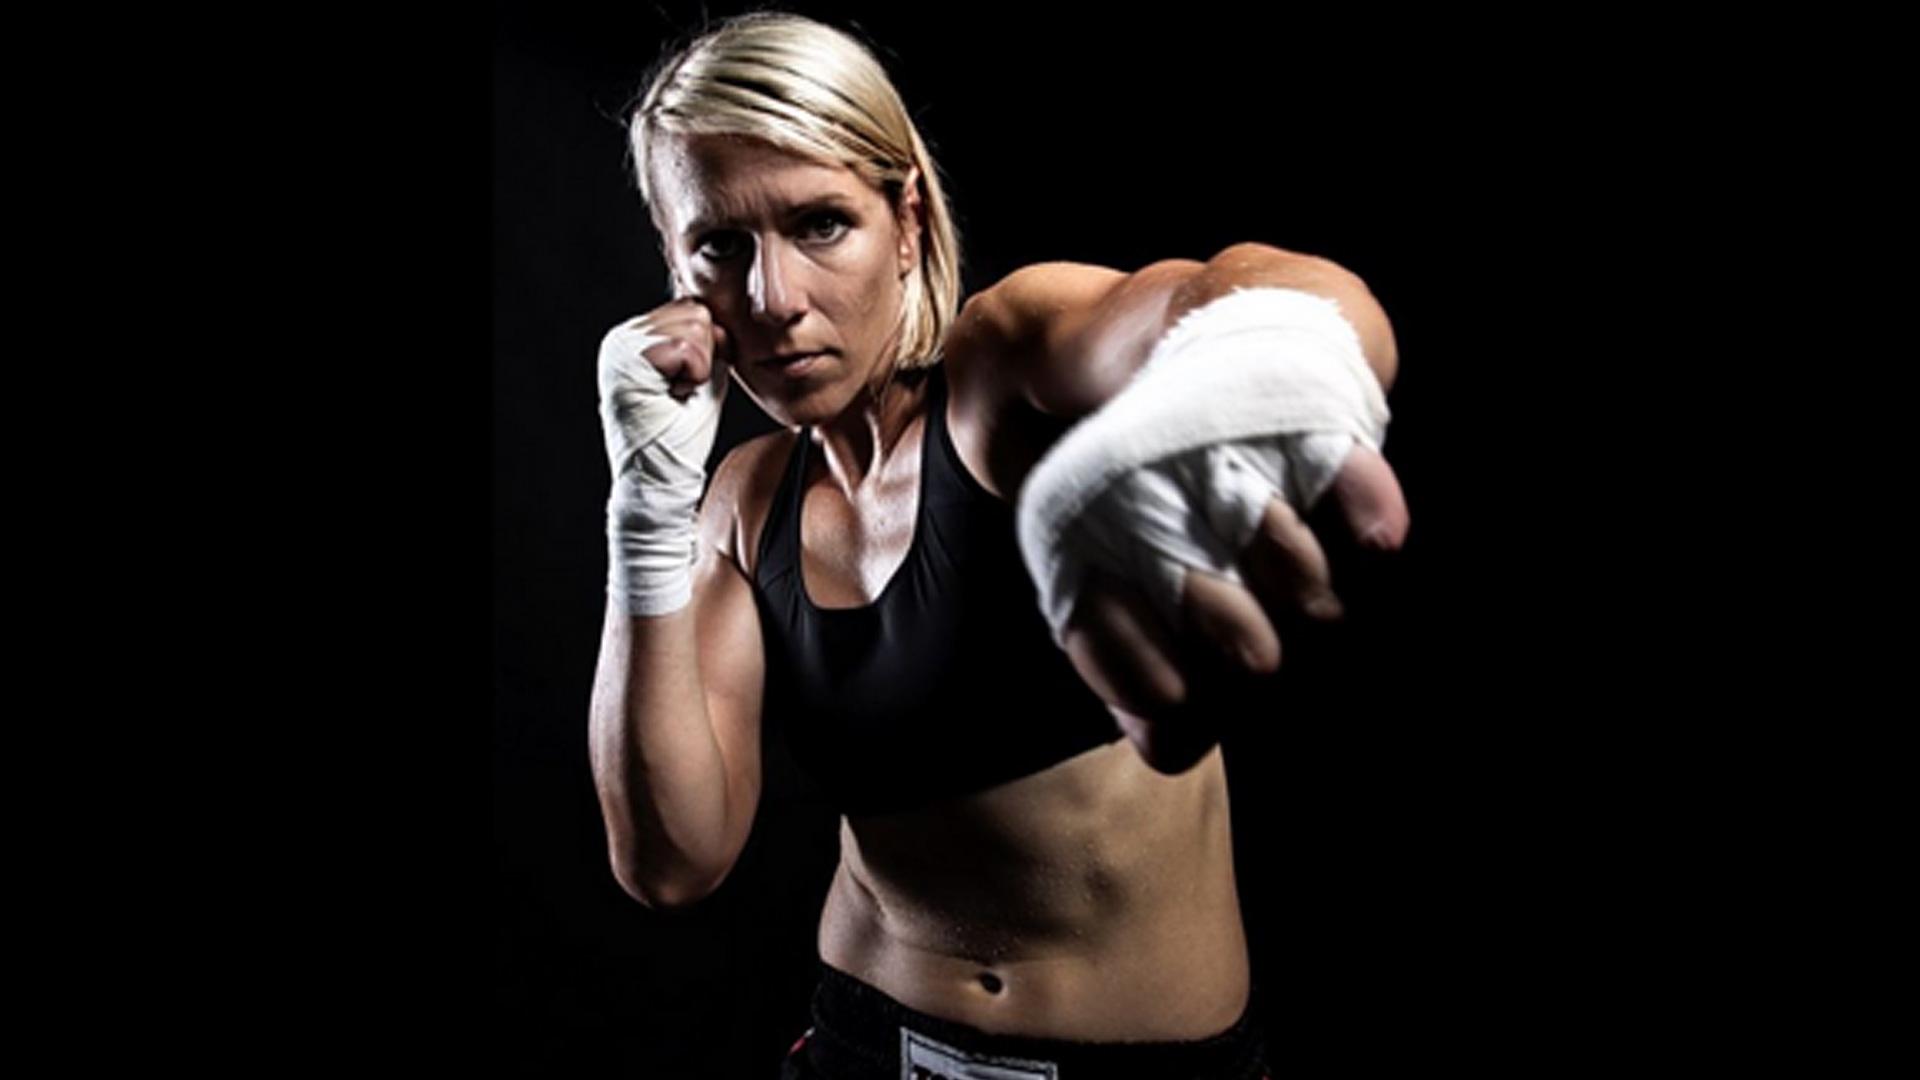 Ex-Kickbox-Weltmeisterin Trimmel gründet Quarantainment